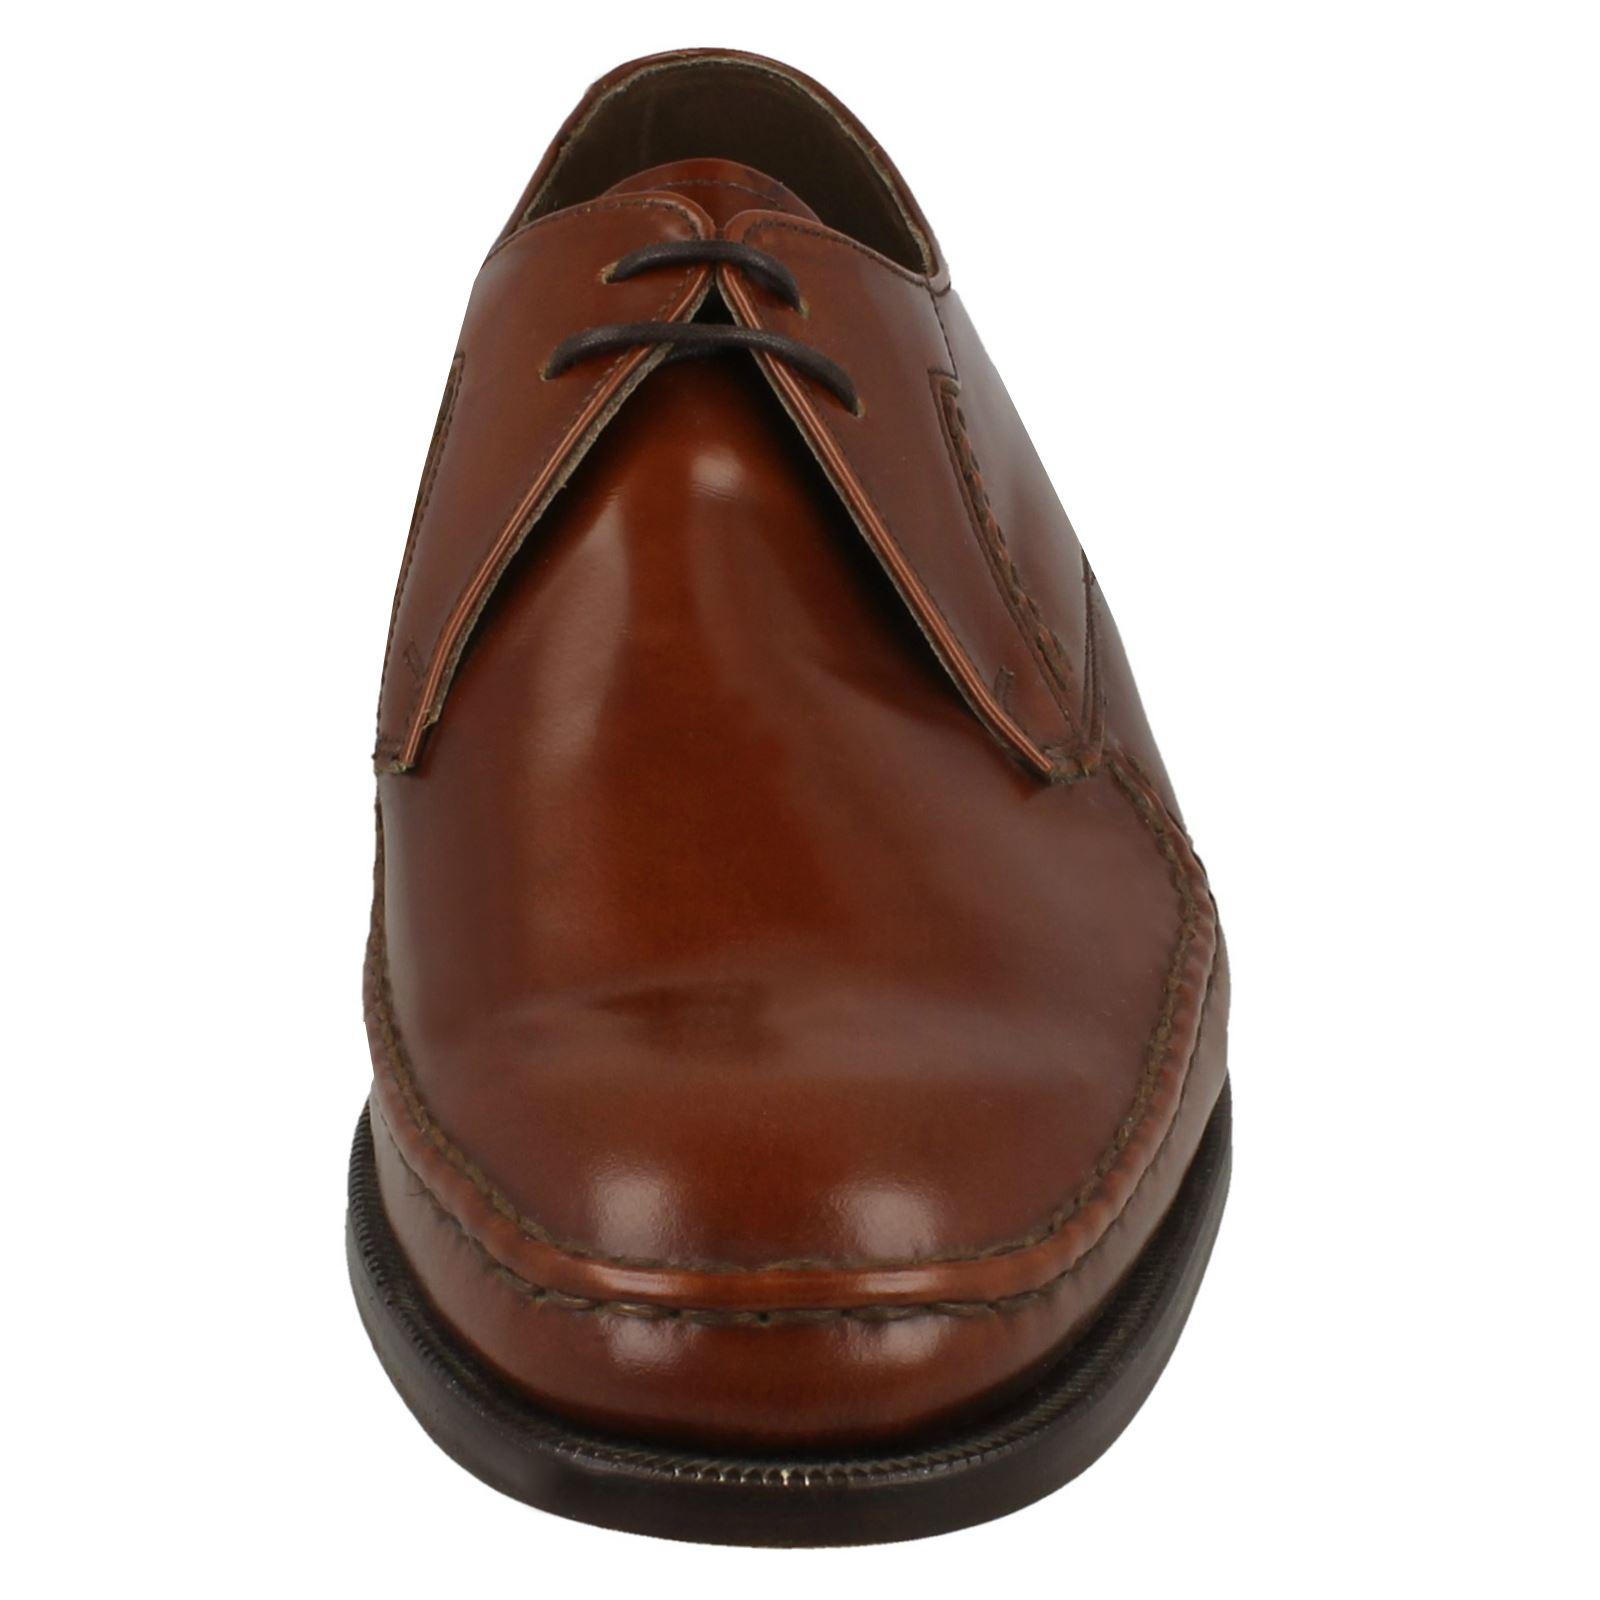 26c791f7 Barker-Mens-Formal-Shoes-Pitney thumbnail 18